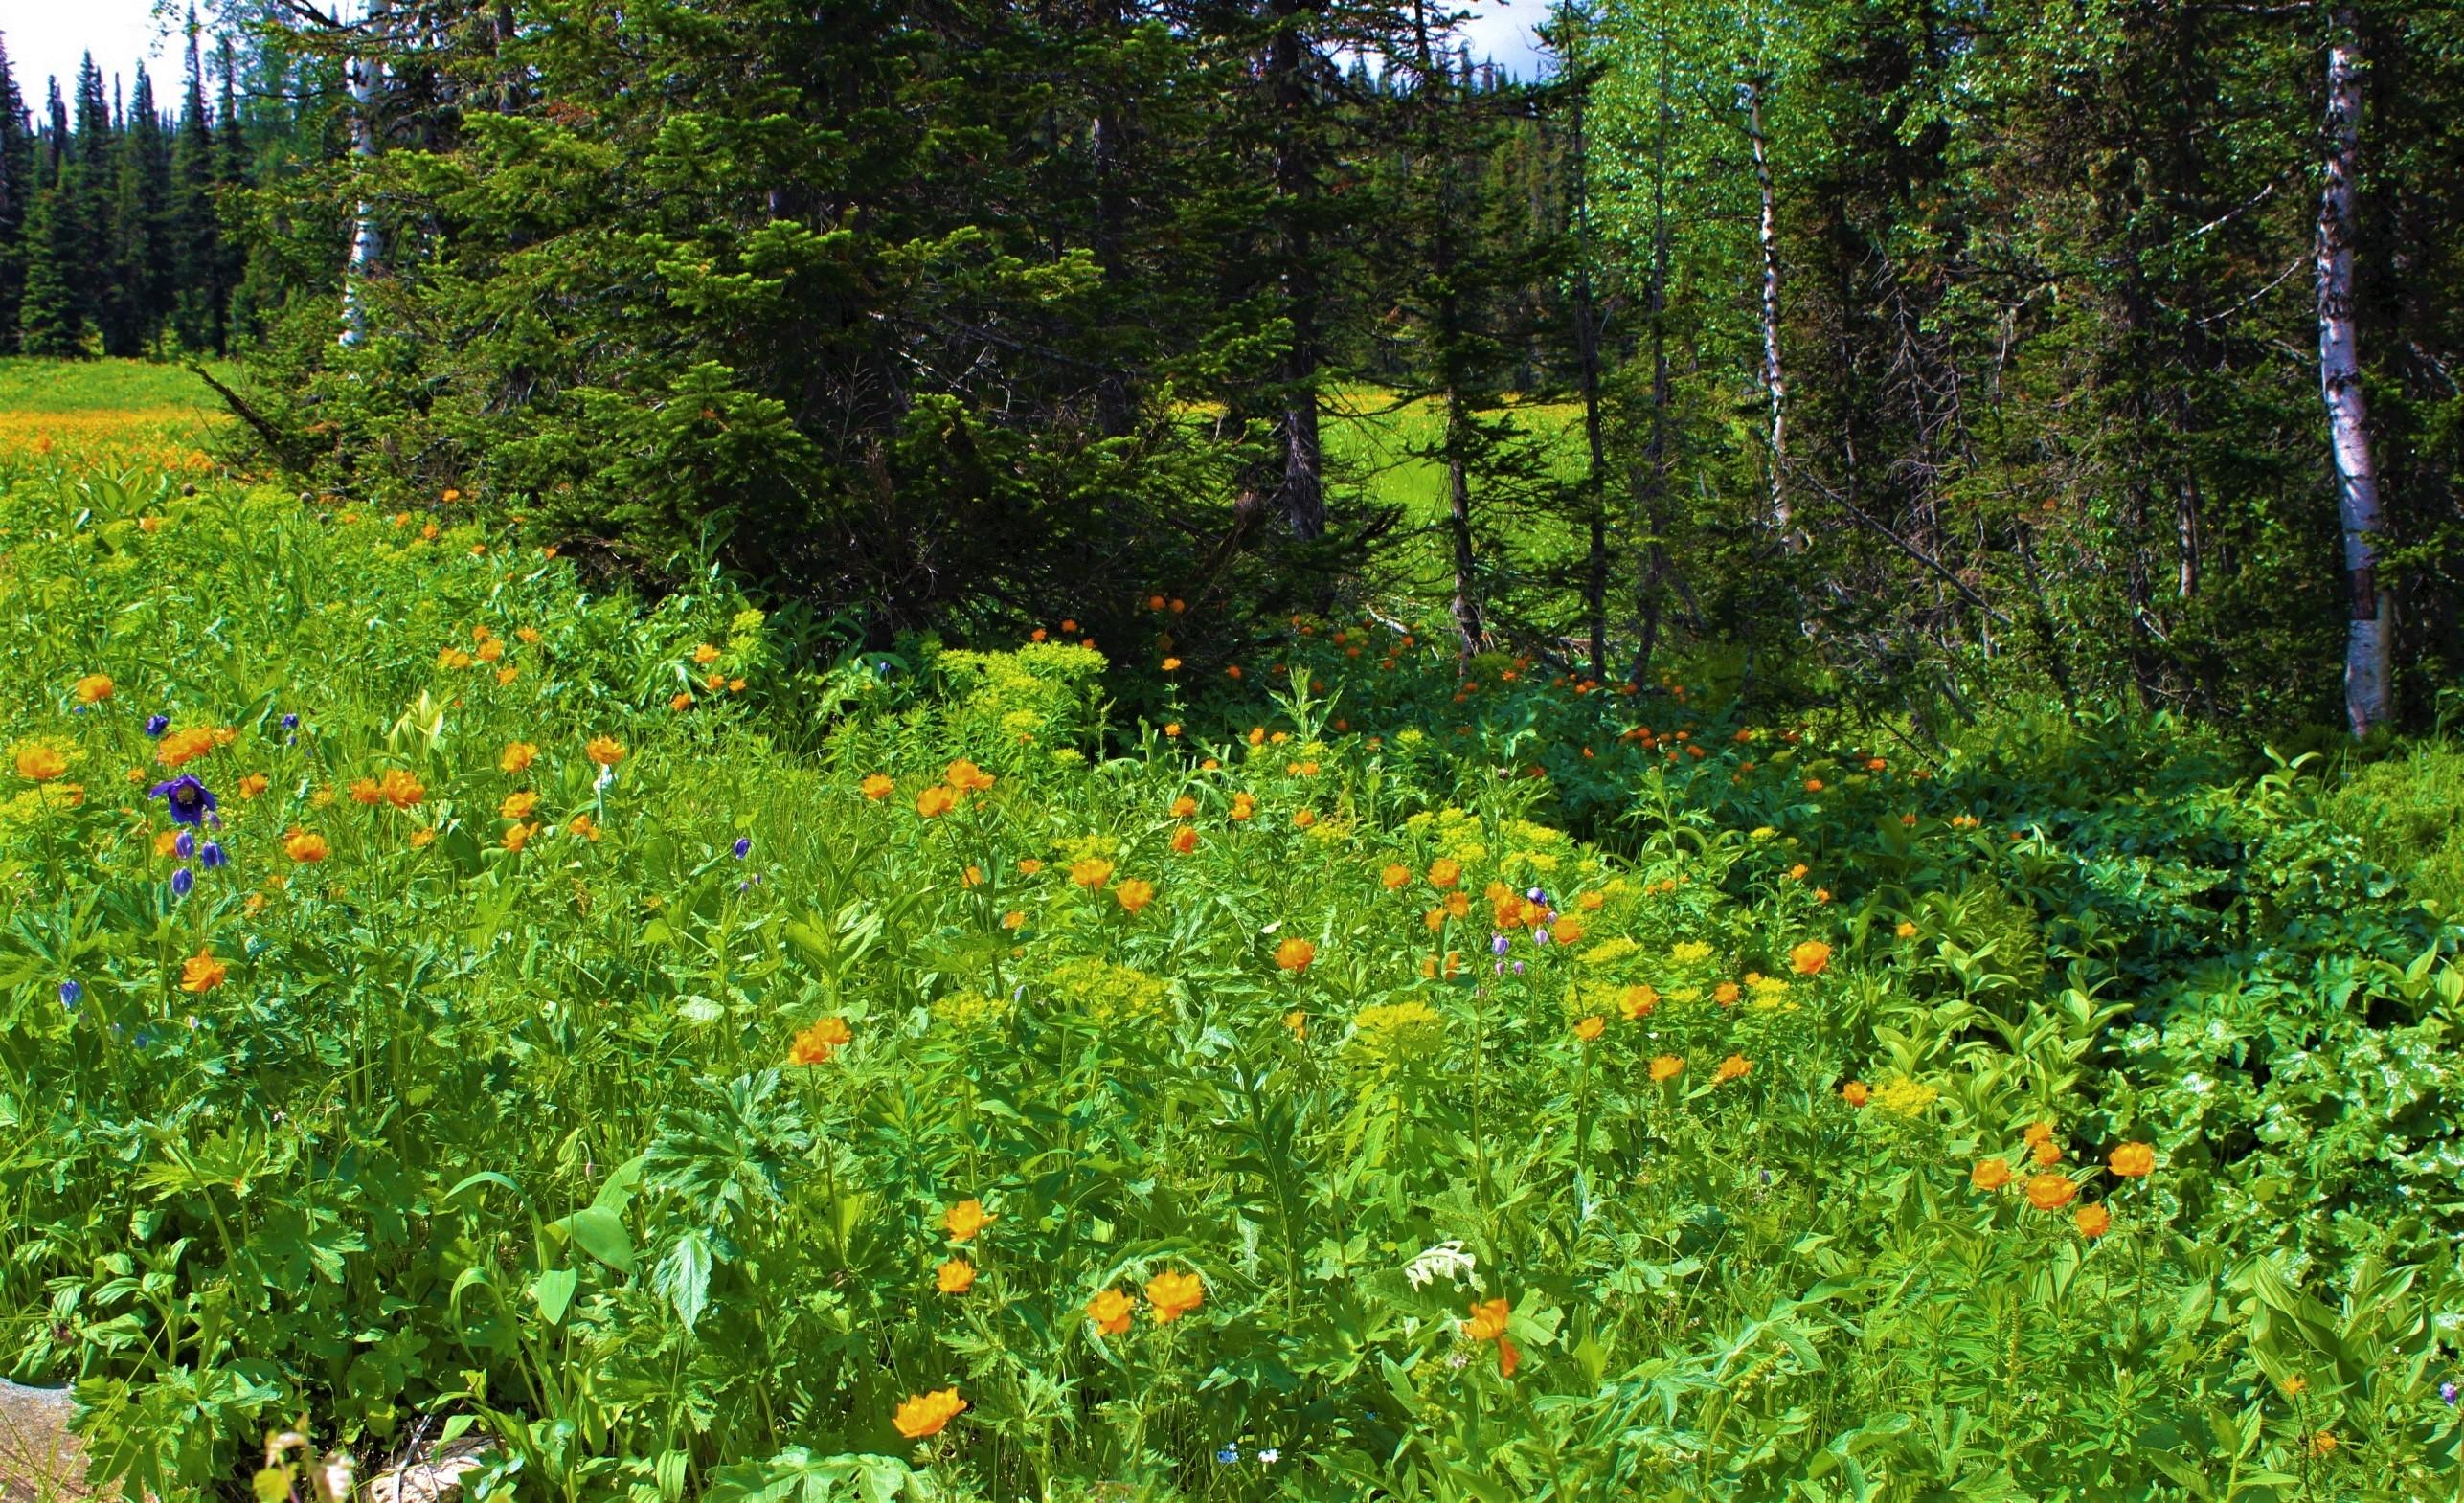 IMG_6150.JPG Цветут в июне поляны